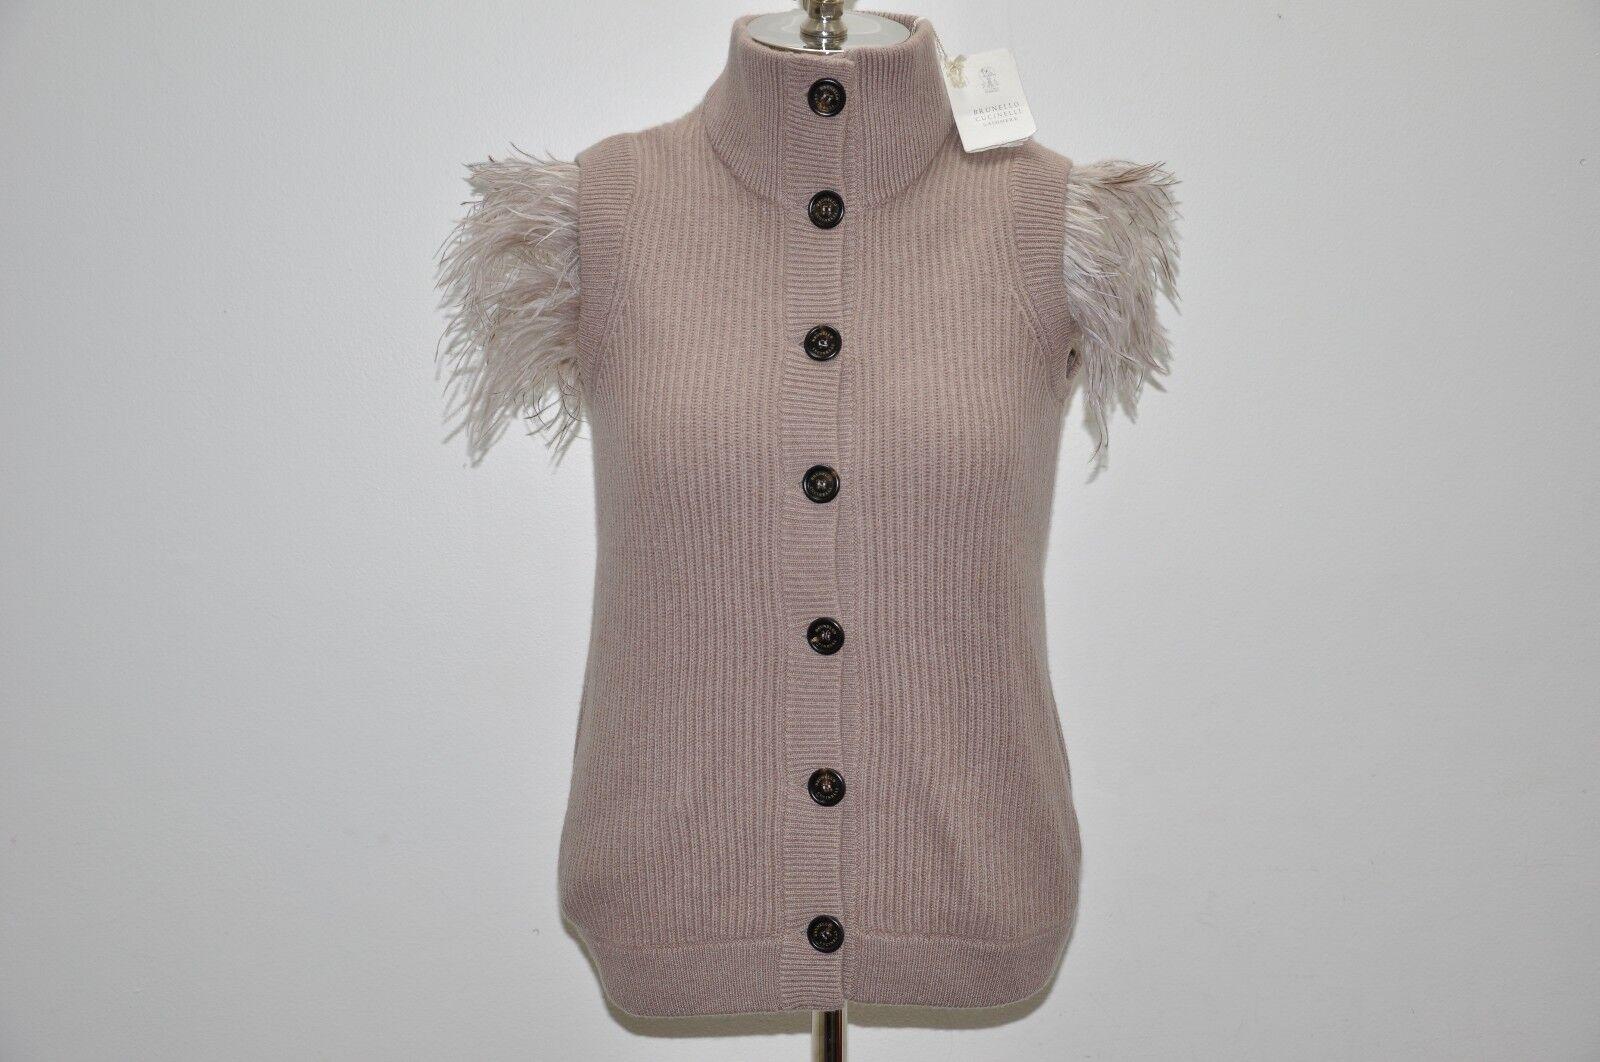 Brunello Cucinelli Ostrich Feather Fur 100% Cashmere Cardigan Sweater Vest XL